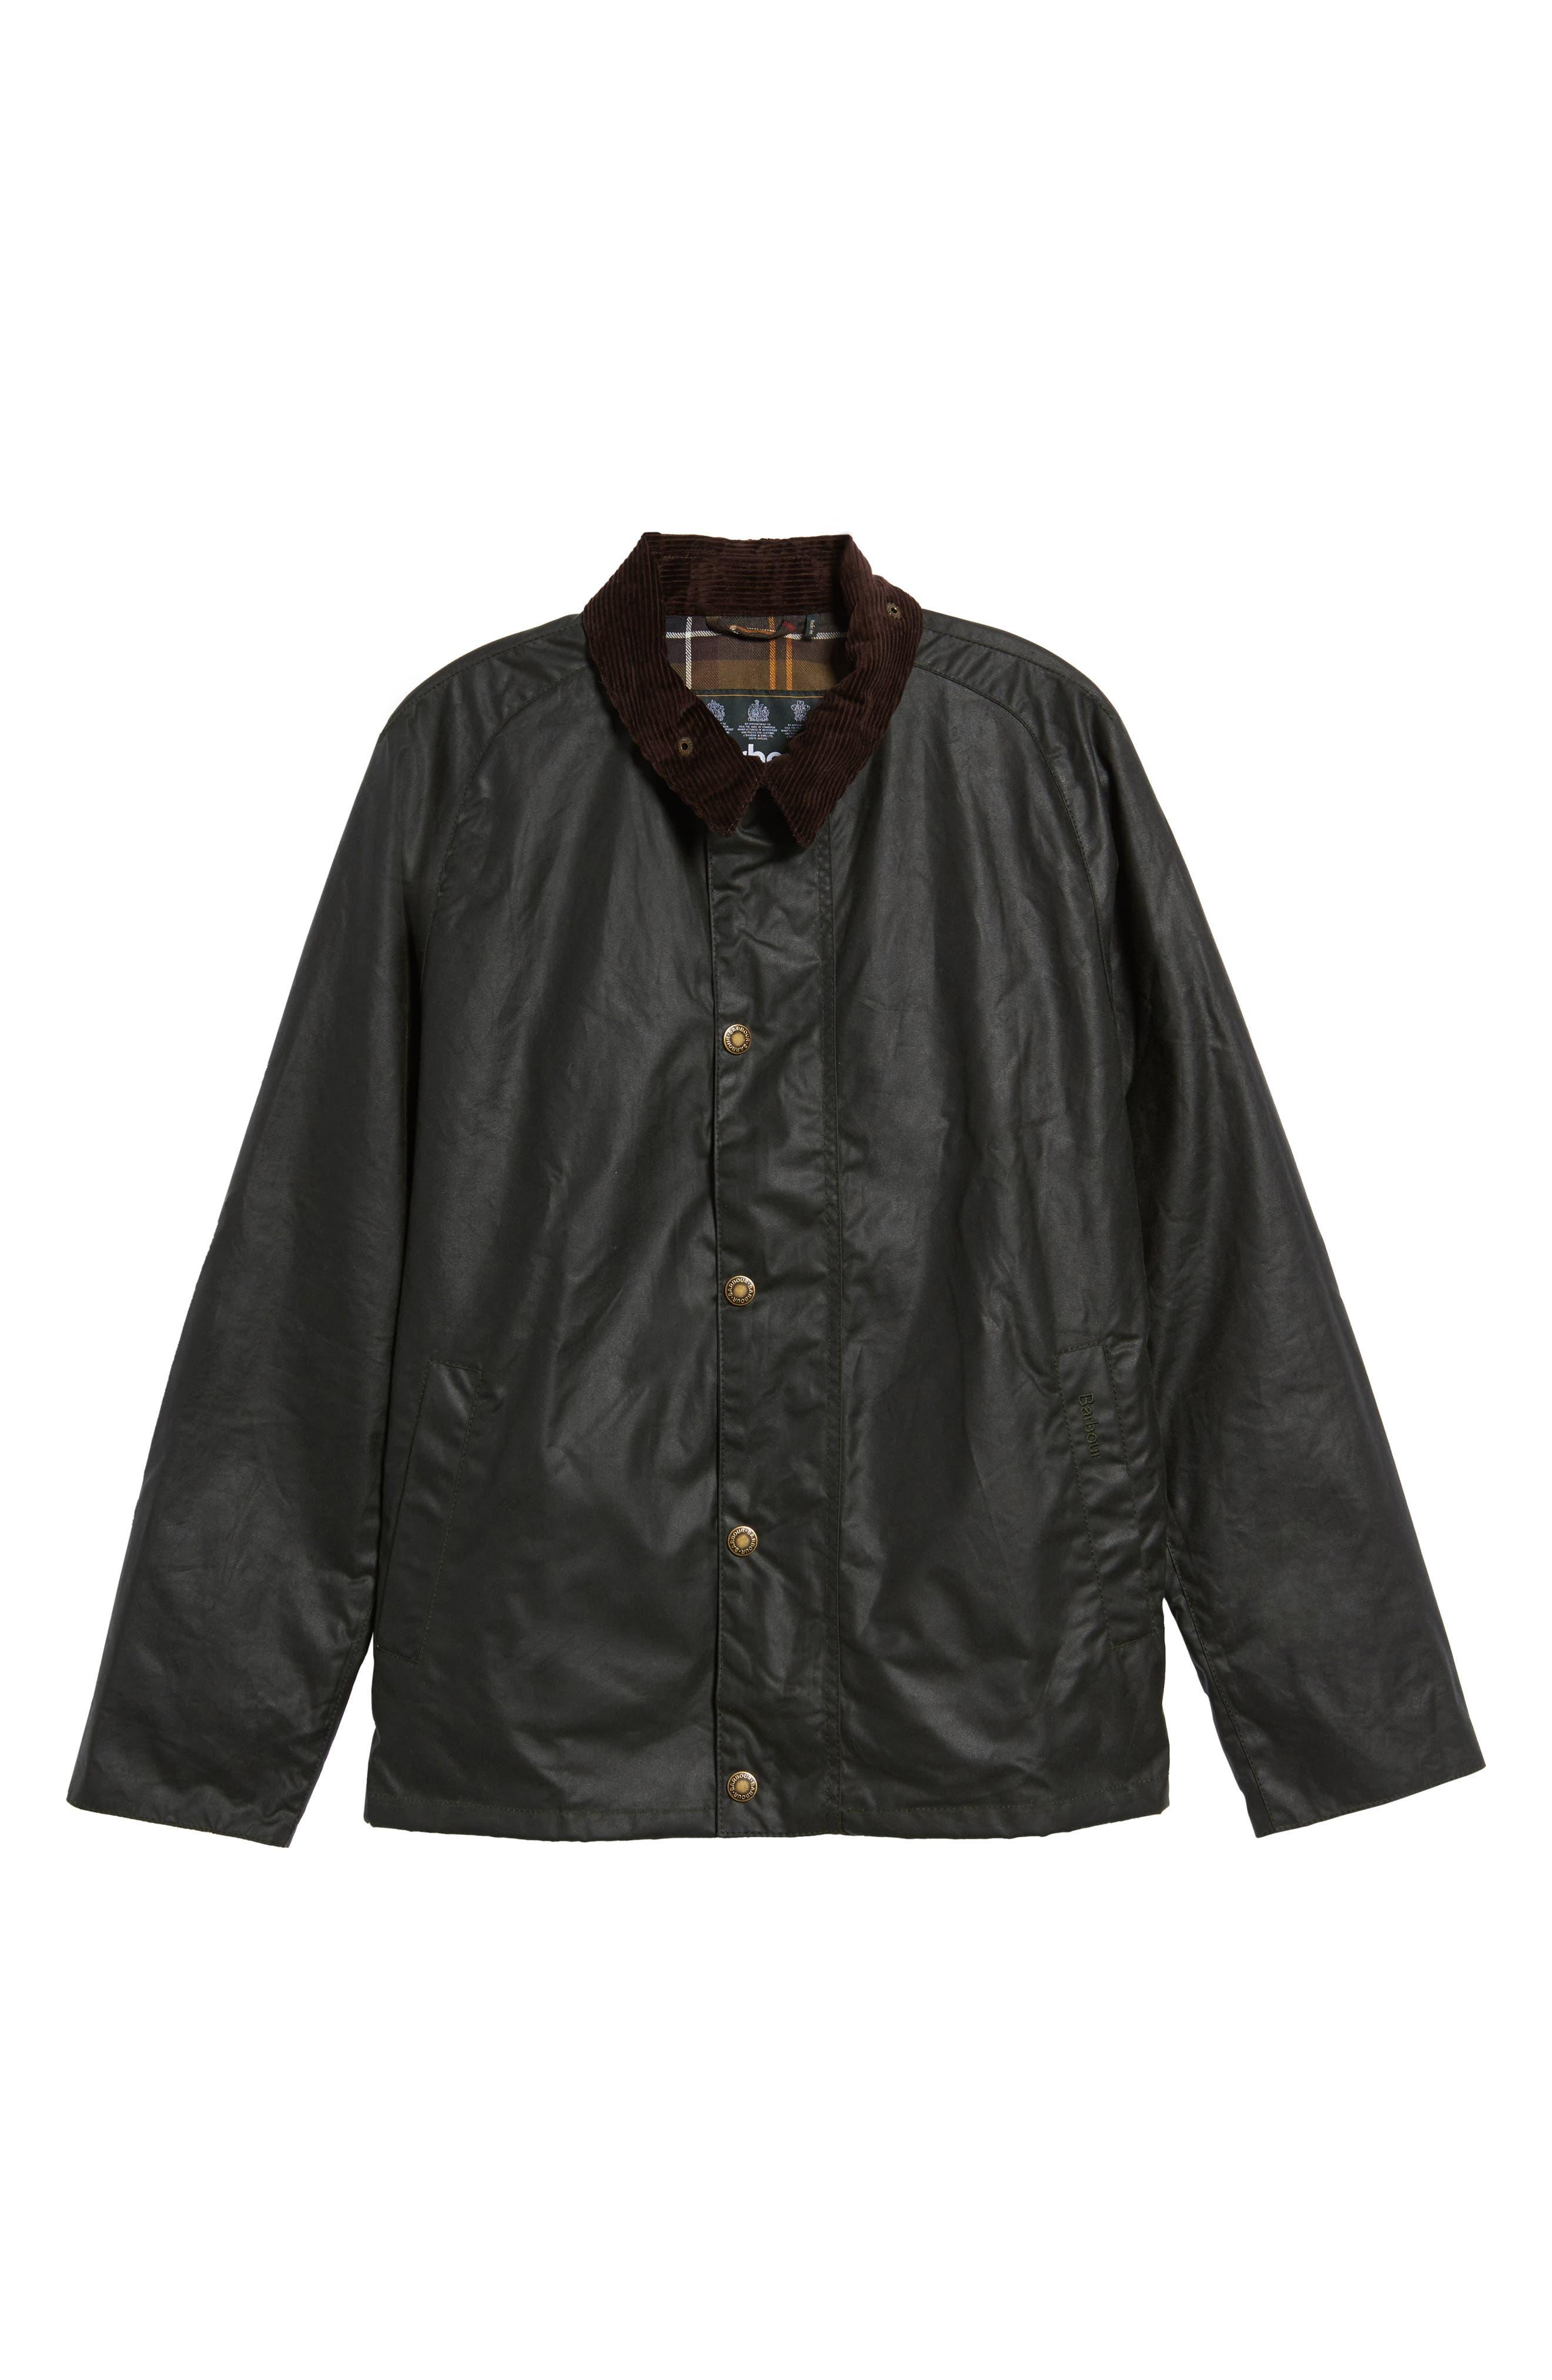 Heskin Waxed Cotton Jacket,                             Alternate thumbnail 5, color,                             SAGE